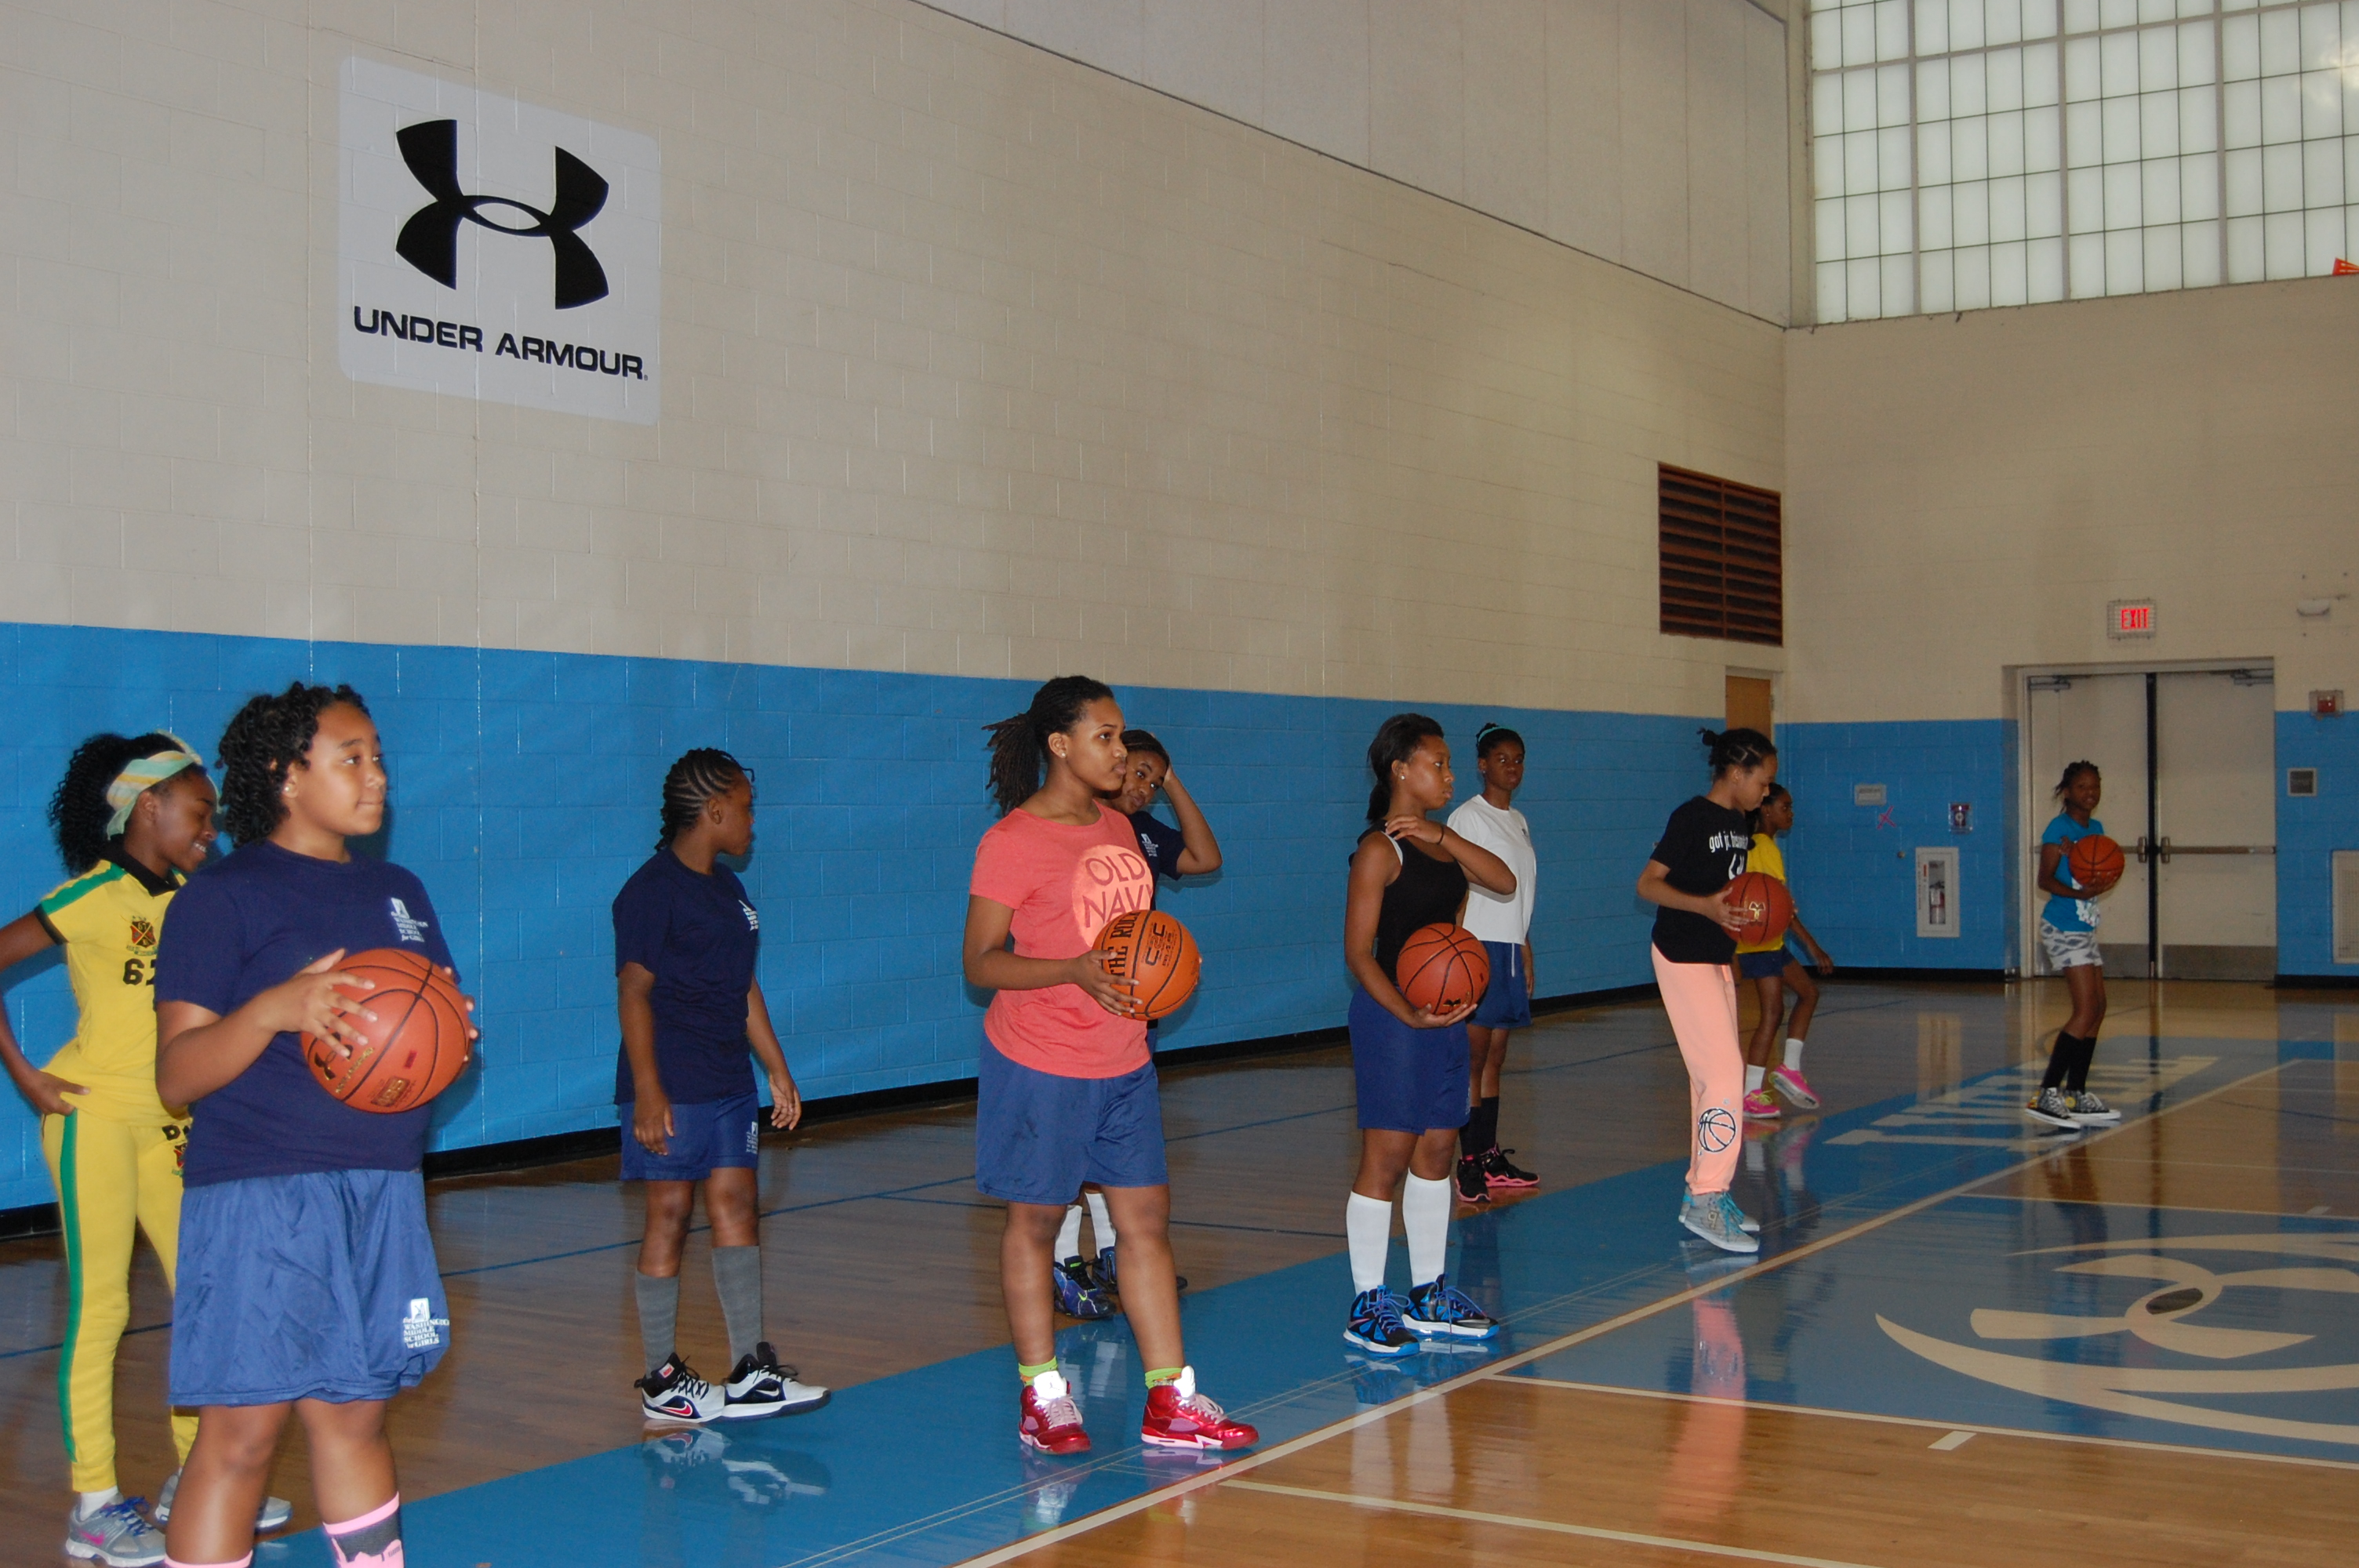 basketball practice.JPG